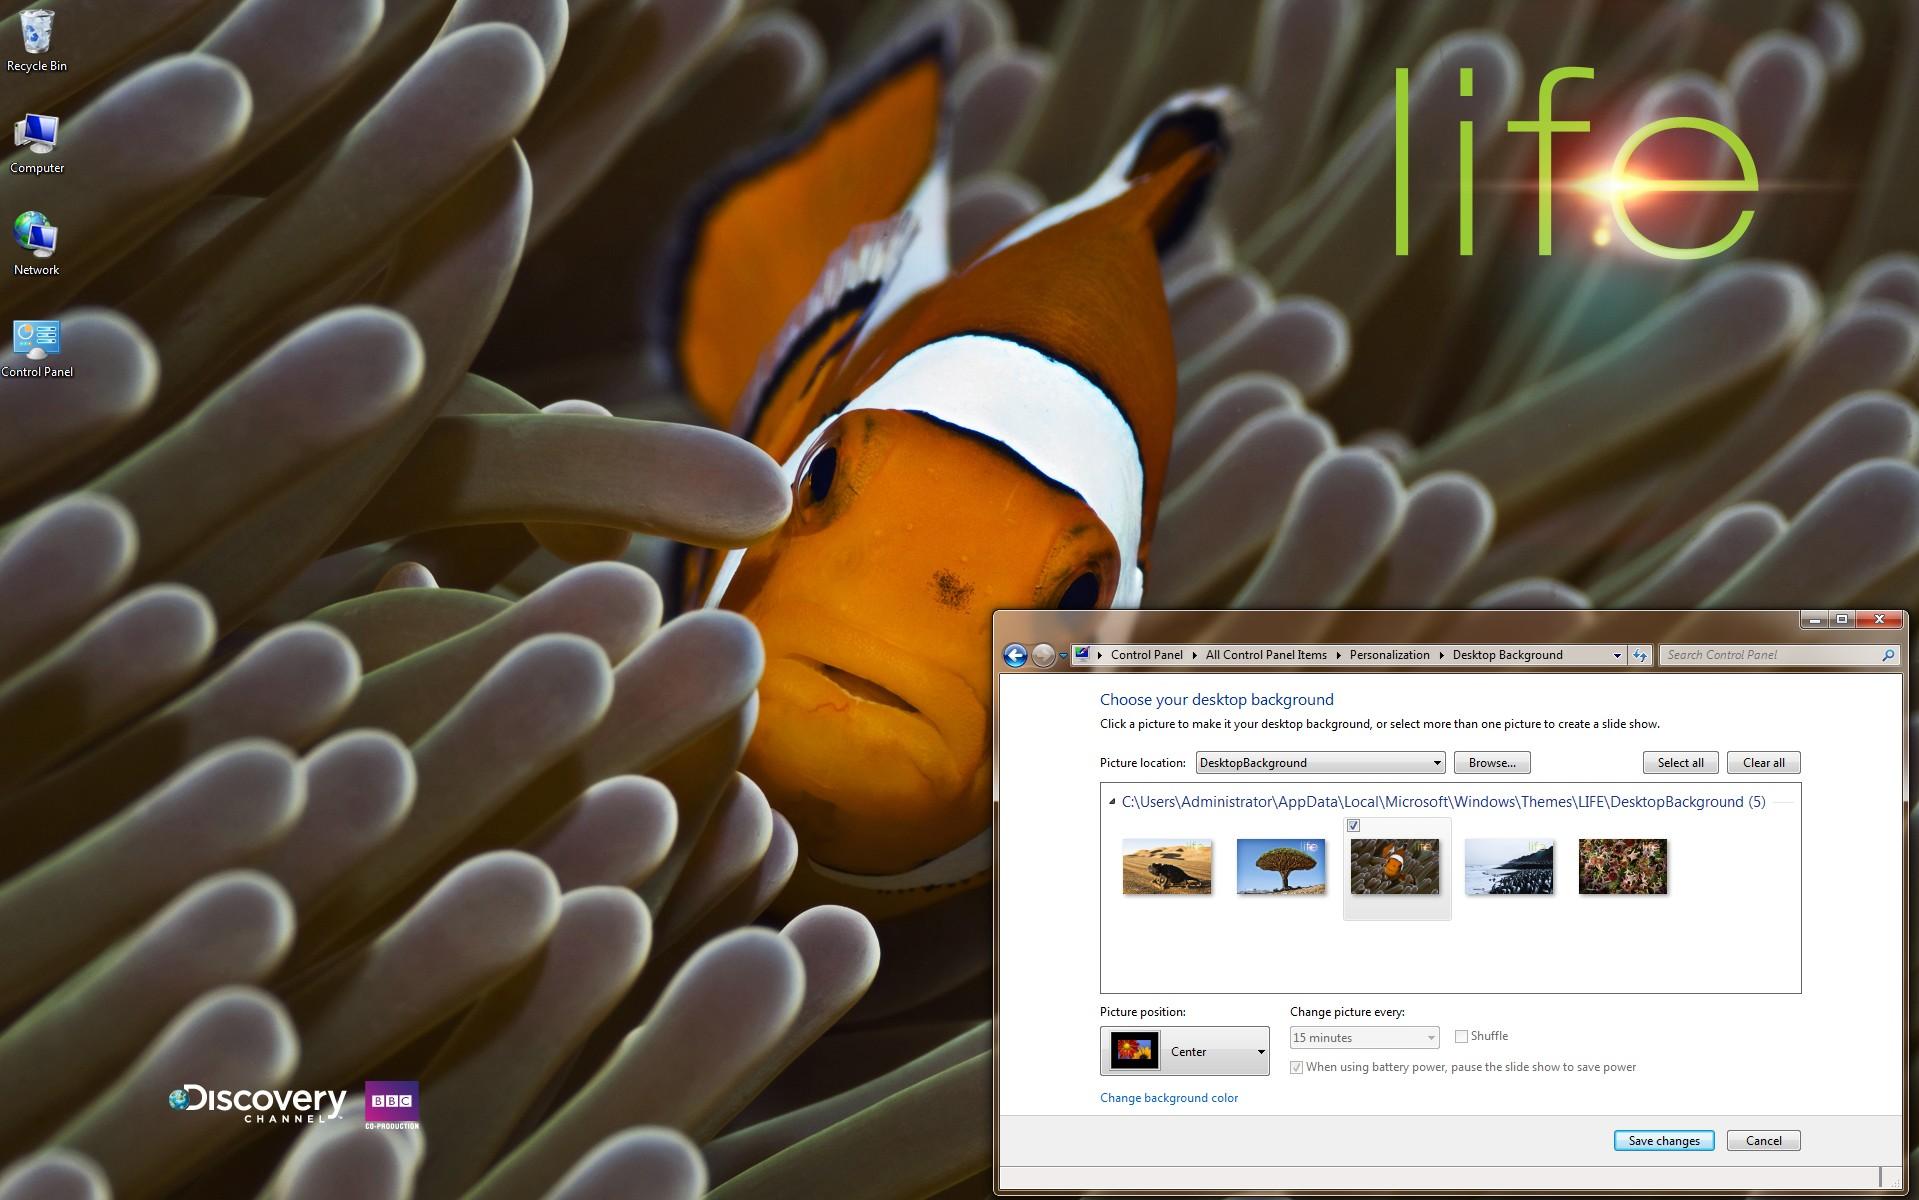 Download LIFE Windows 7 Theme